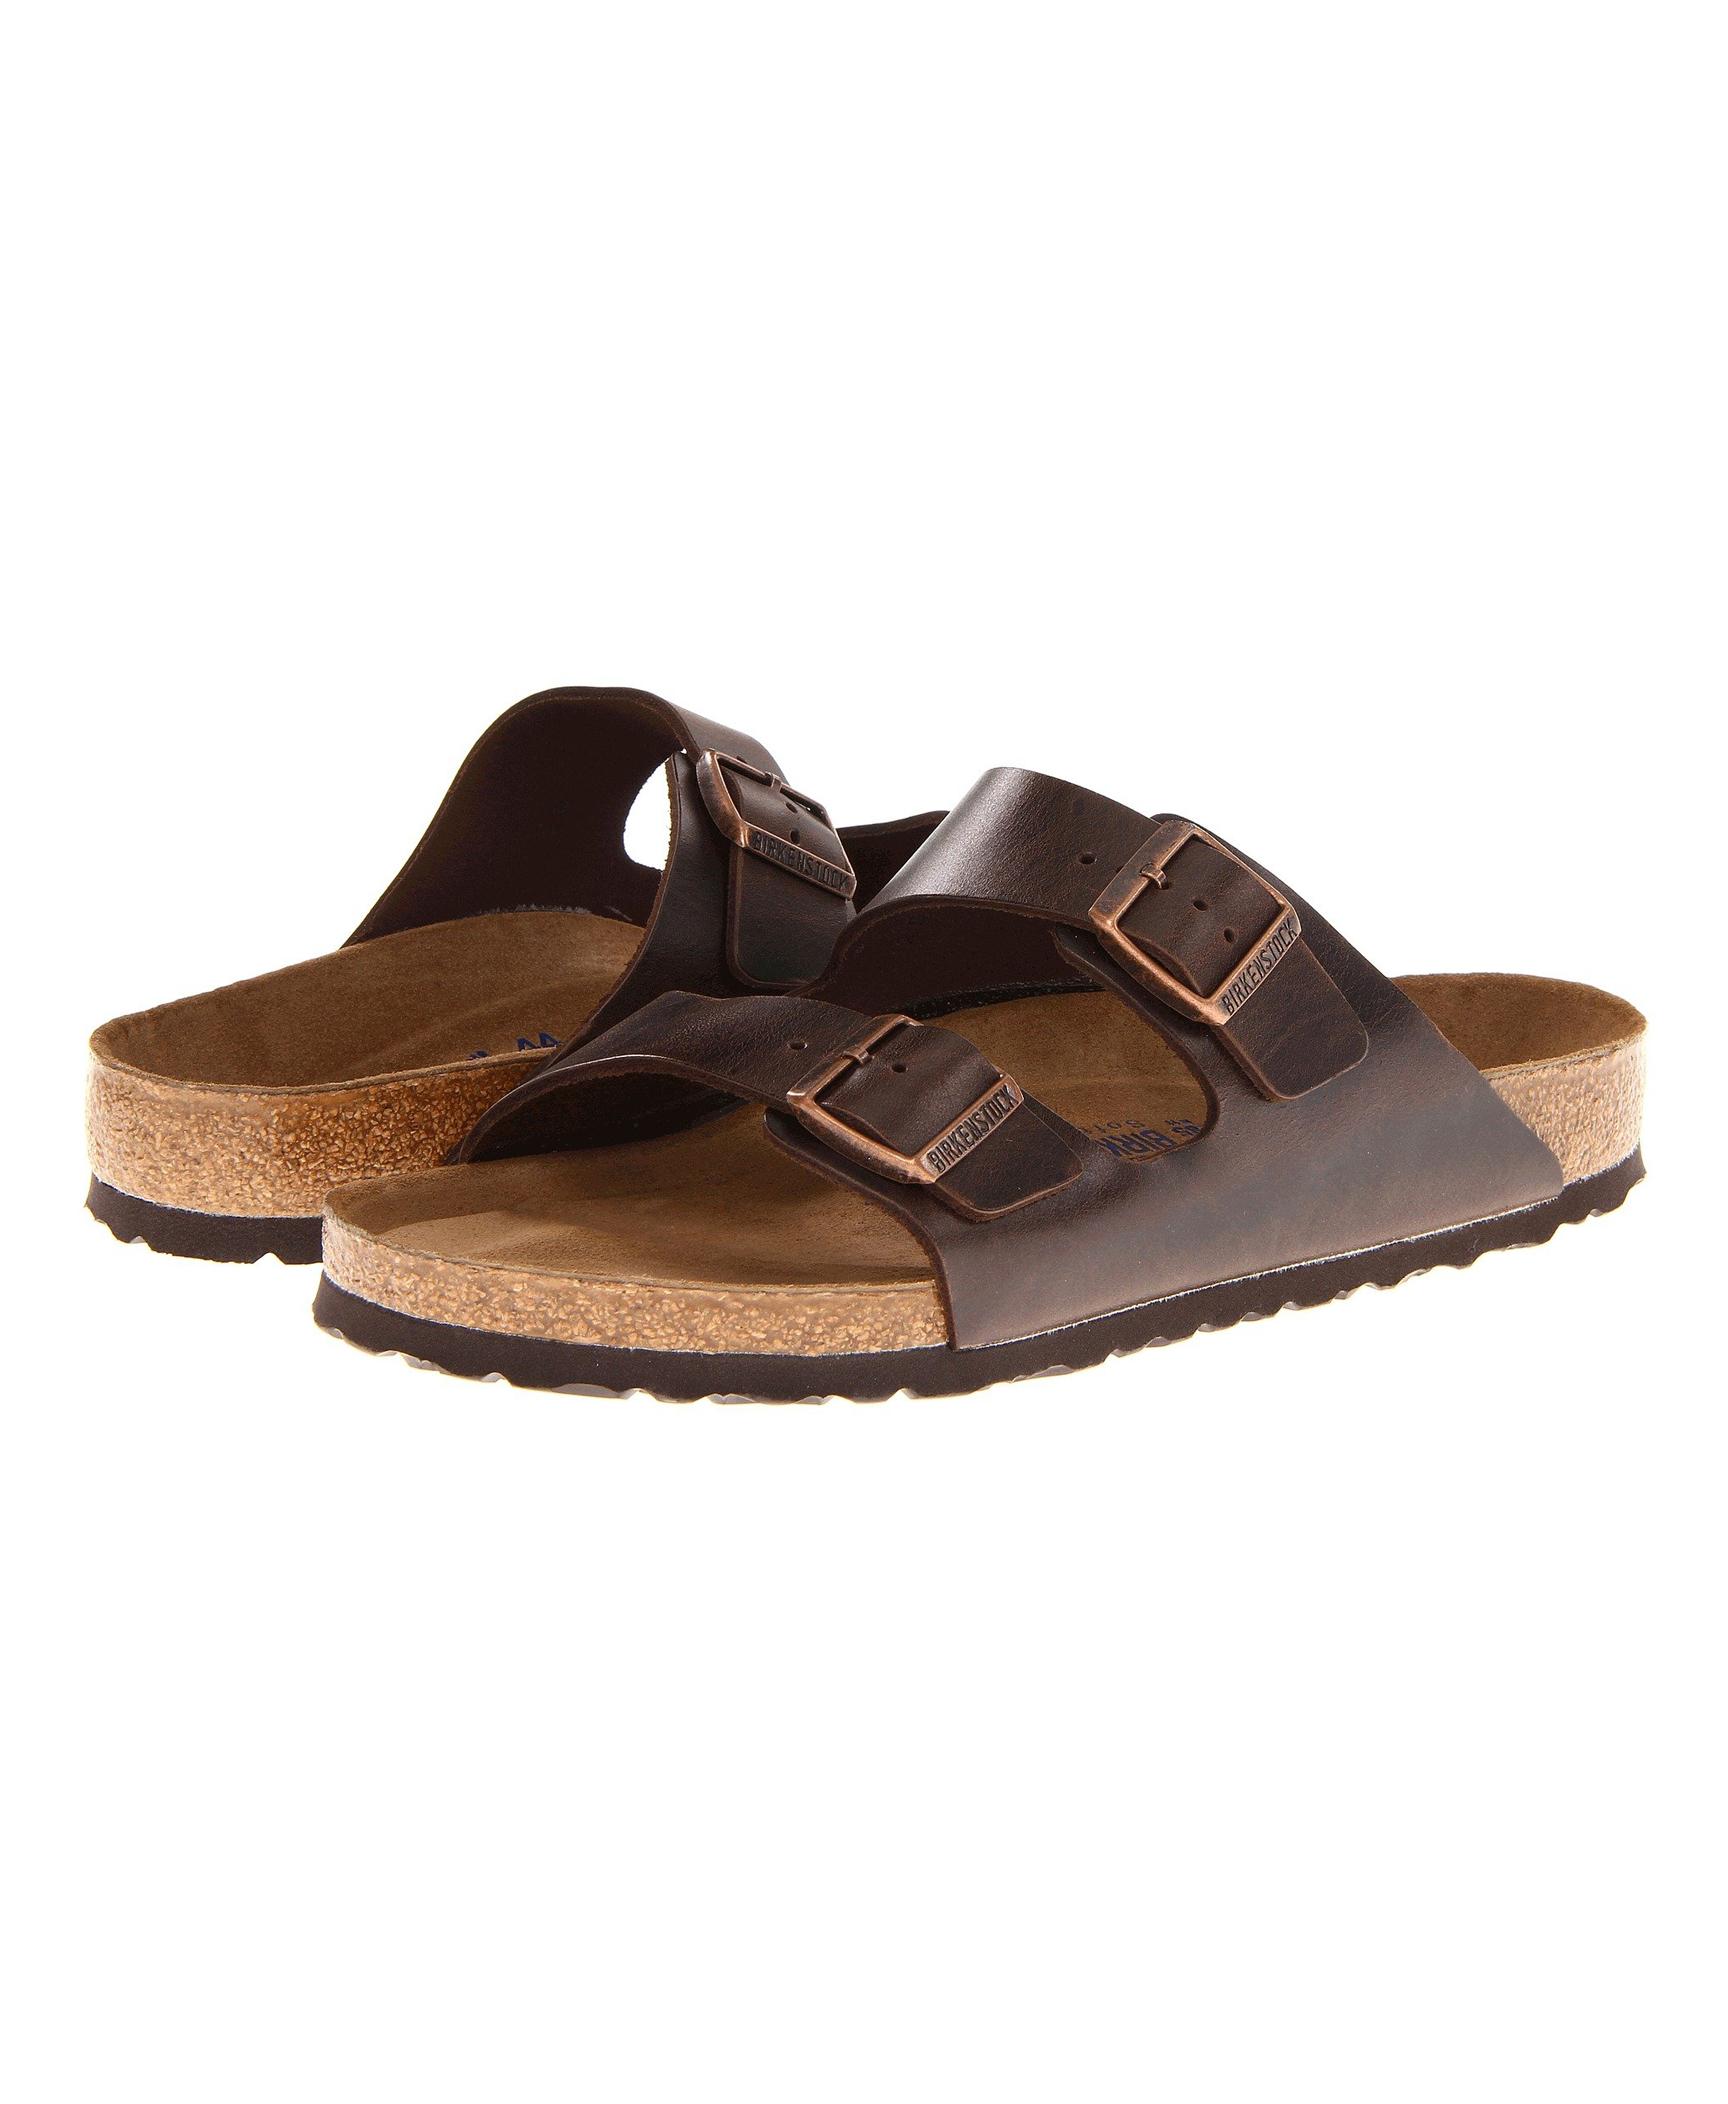 Arizona Soft Footbed Sandals